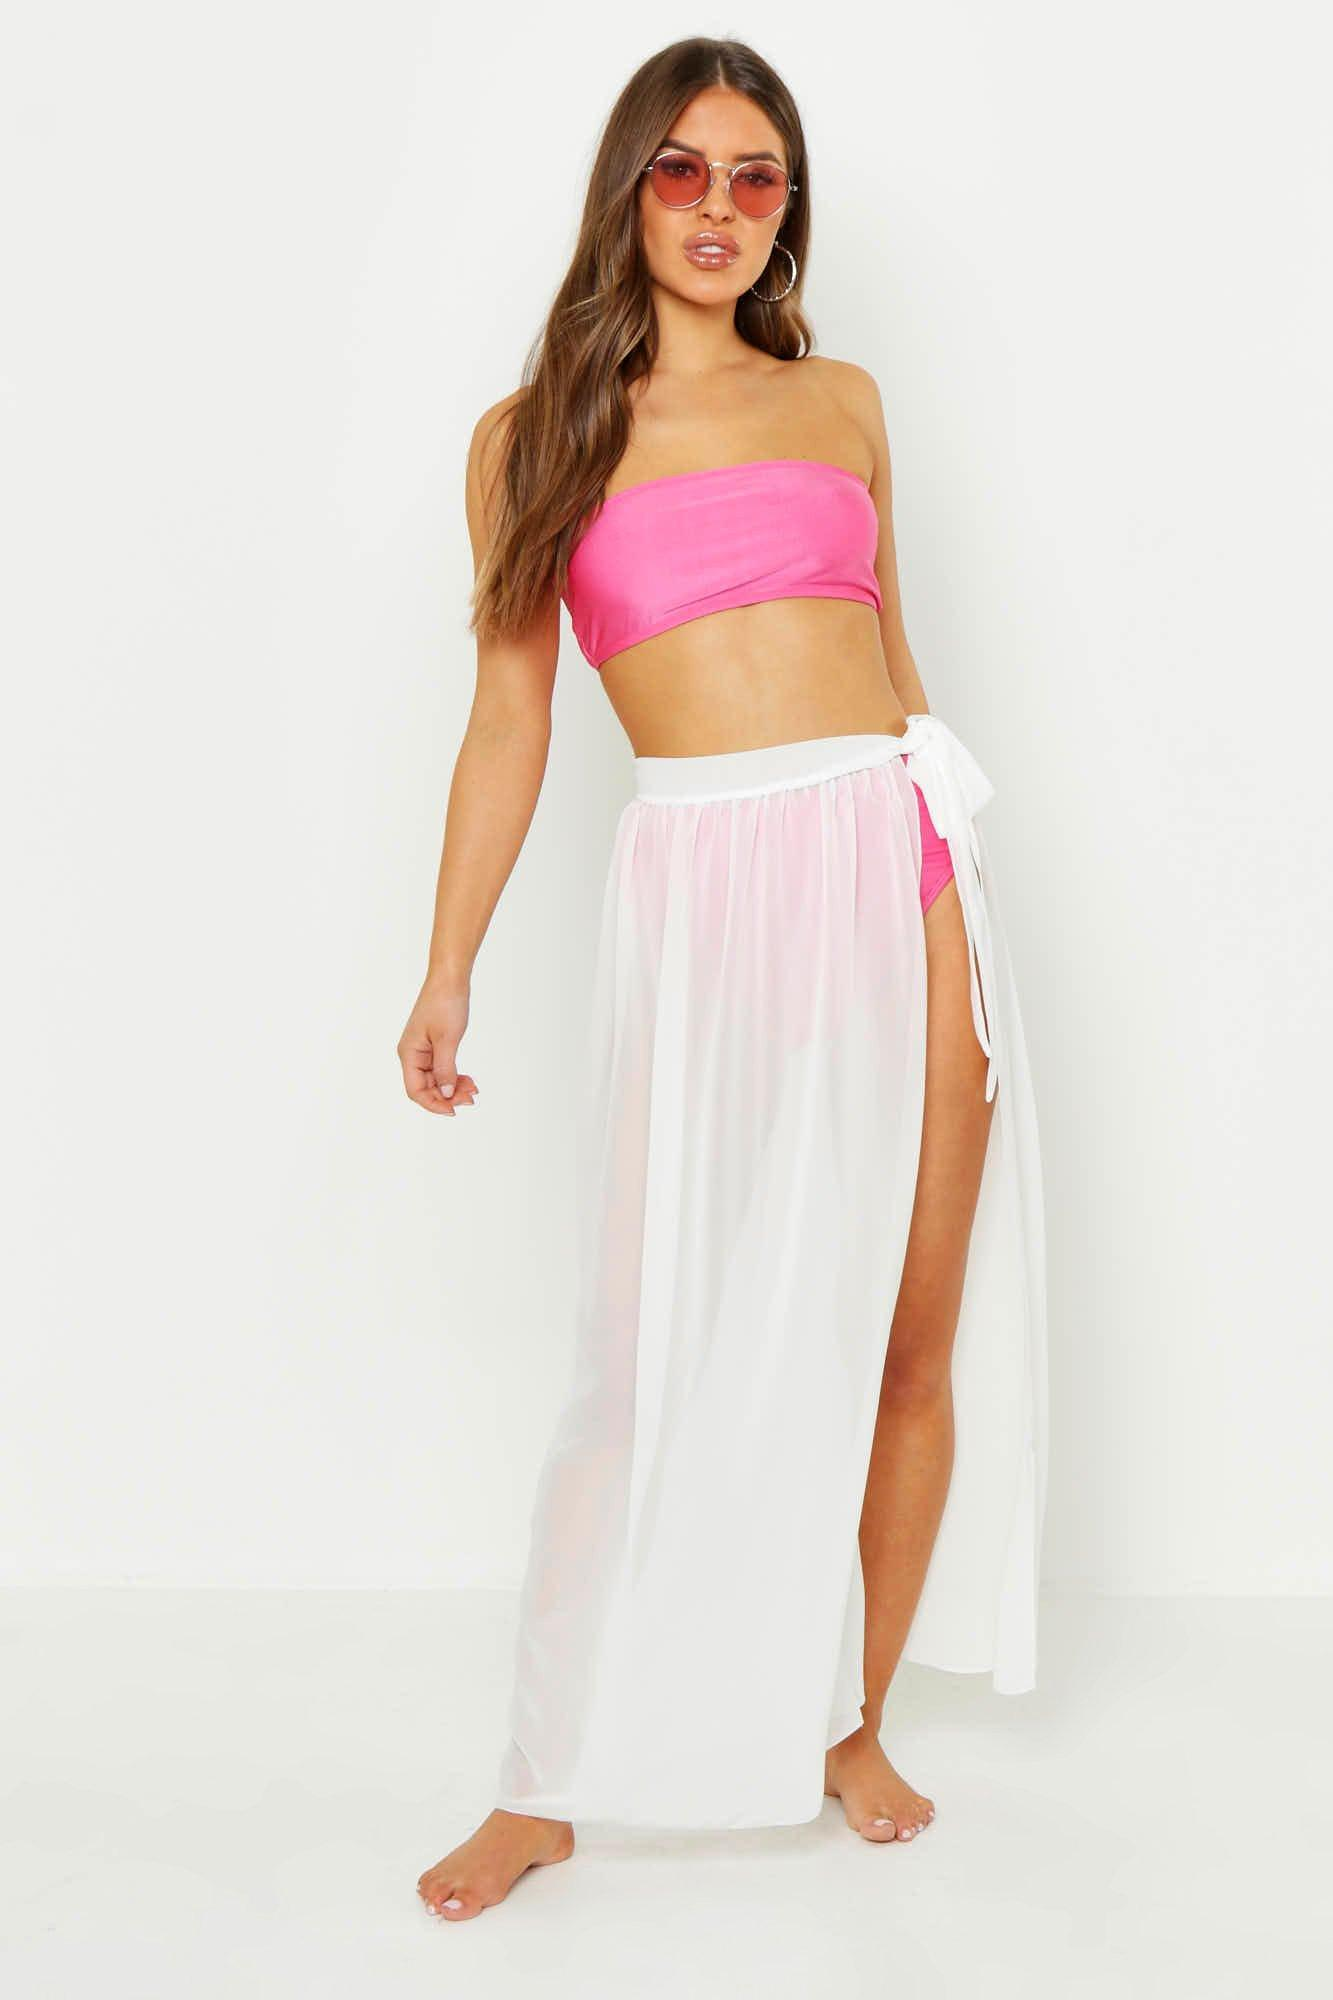 7b2f081b7bea43 Boohoo Petite Chiffon Beach Wrap Maxi Skirt in White - Lyst